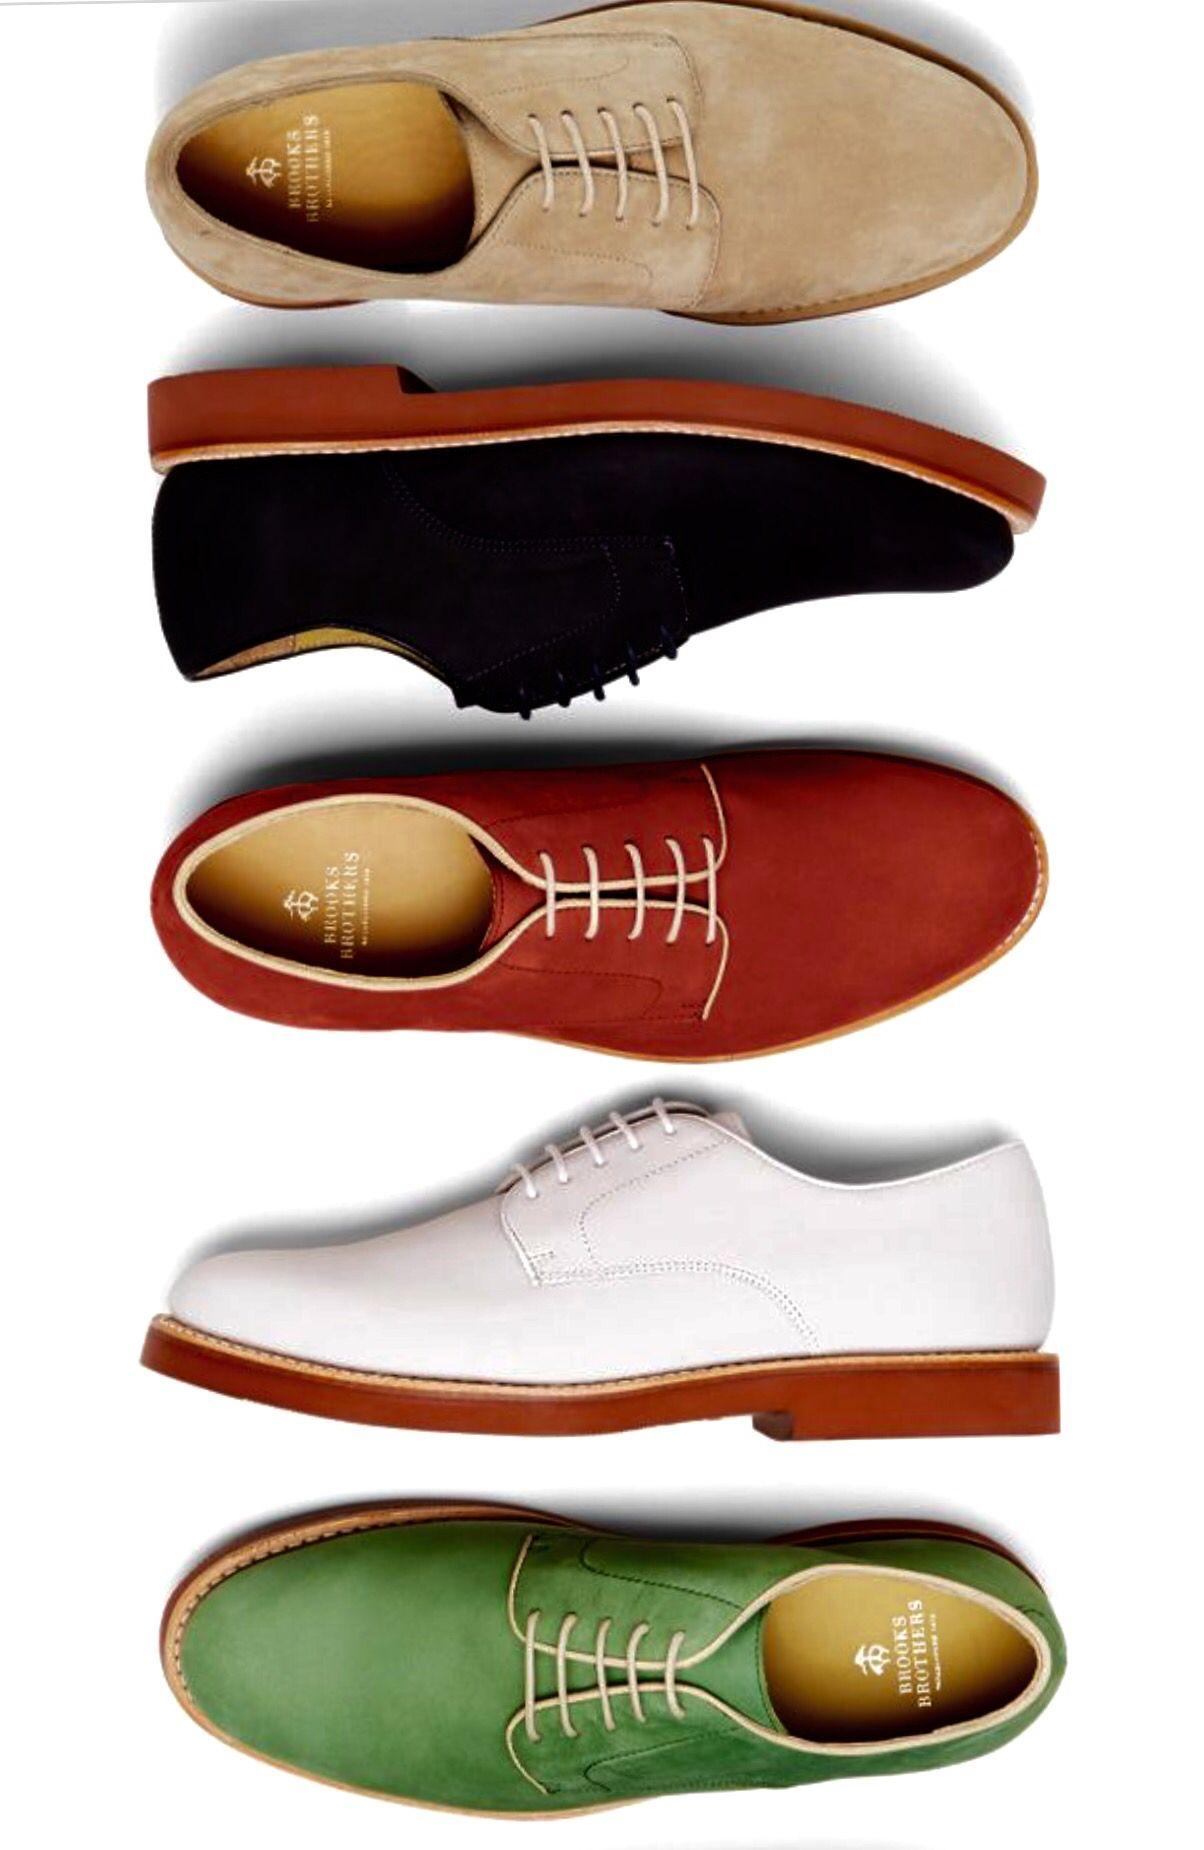 5ed94f553f0ca Brooks Brothers - Classic buckskin oxford shoes | Shoes | Mens ...